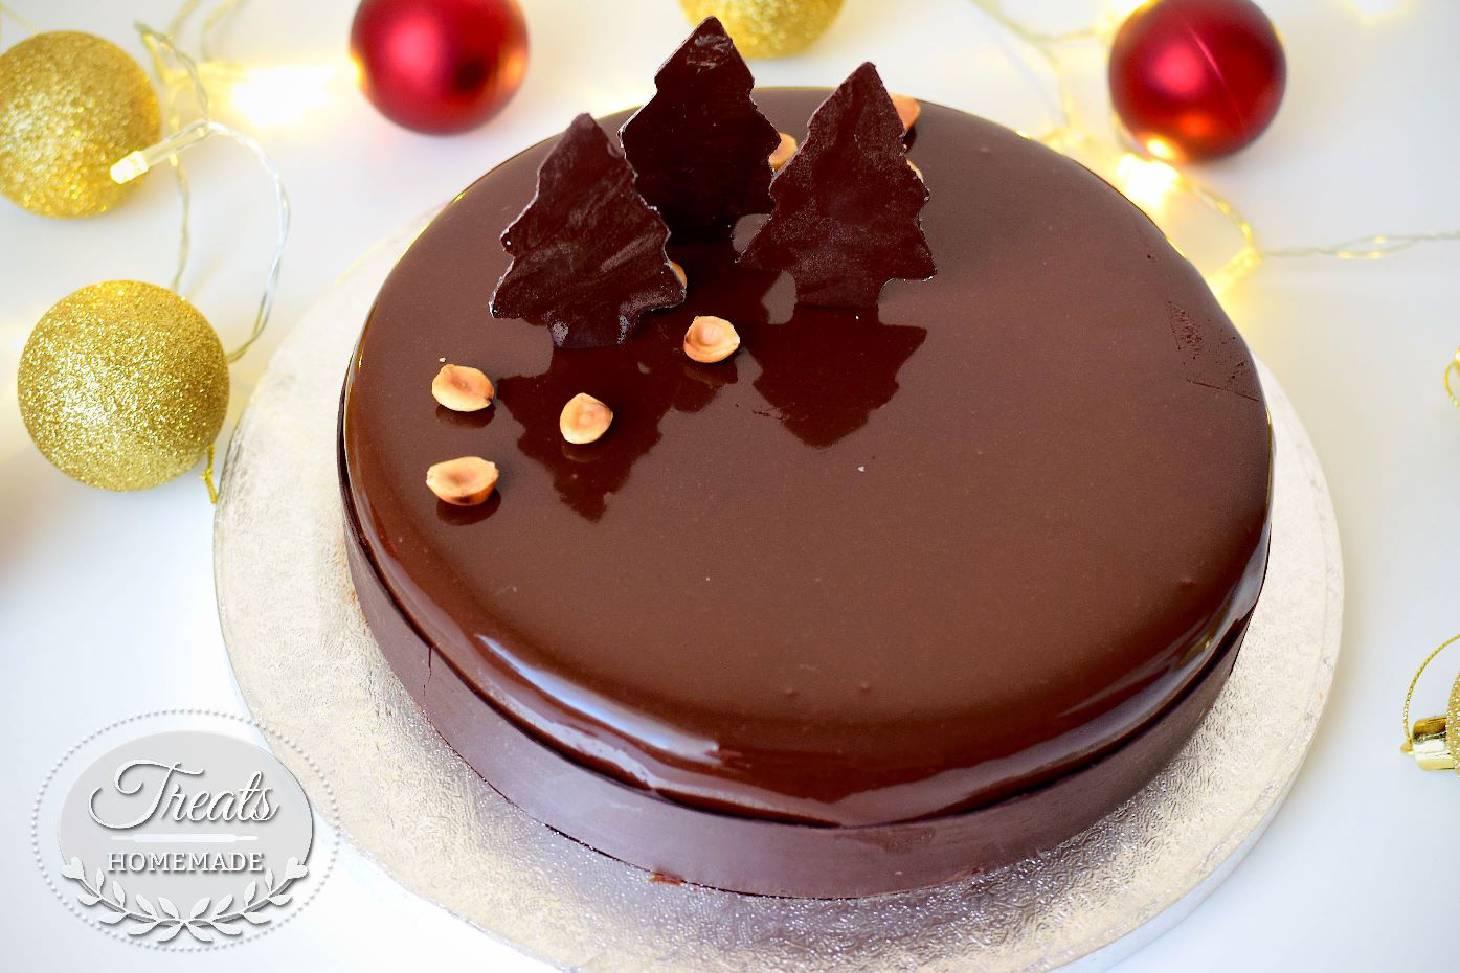 Royal Au Chocolat - Trianon